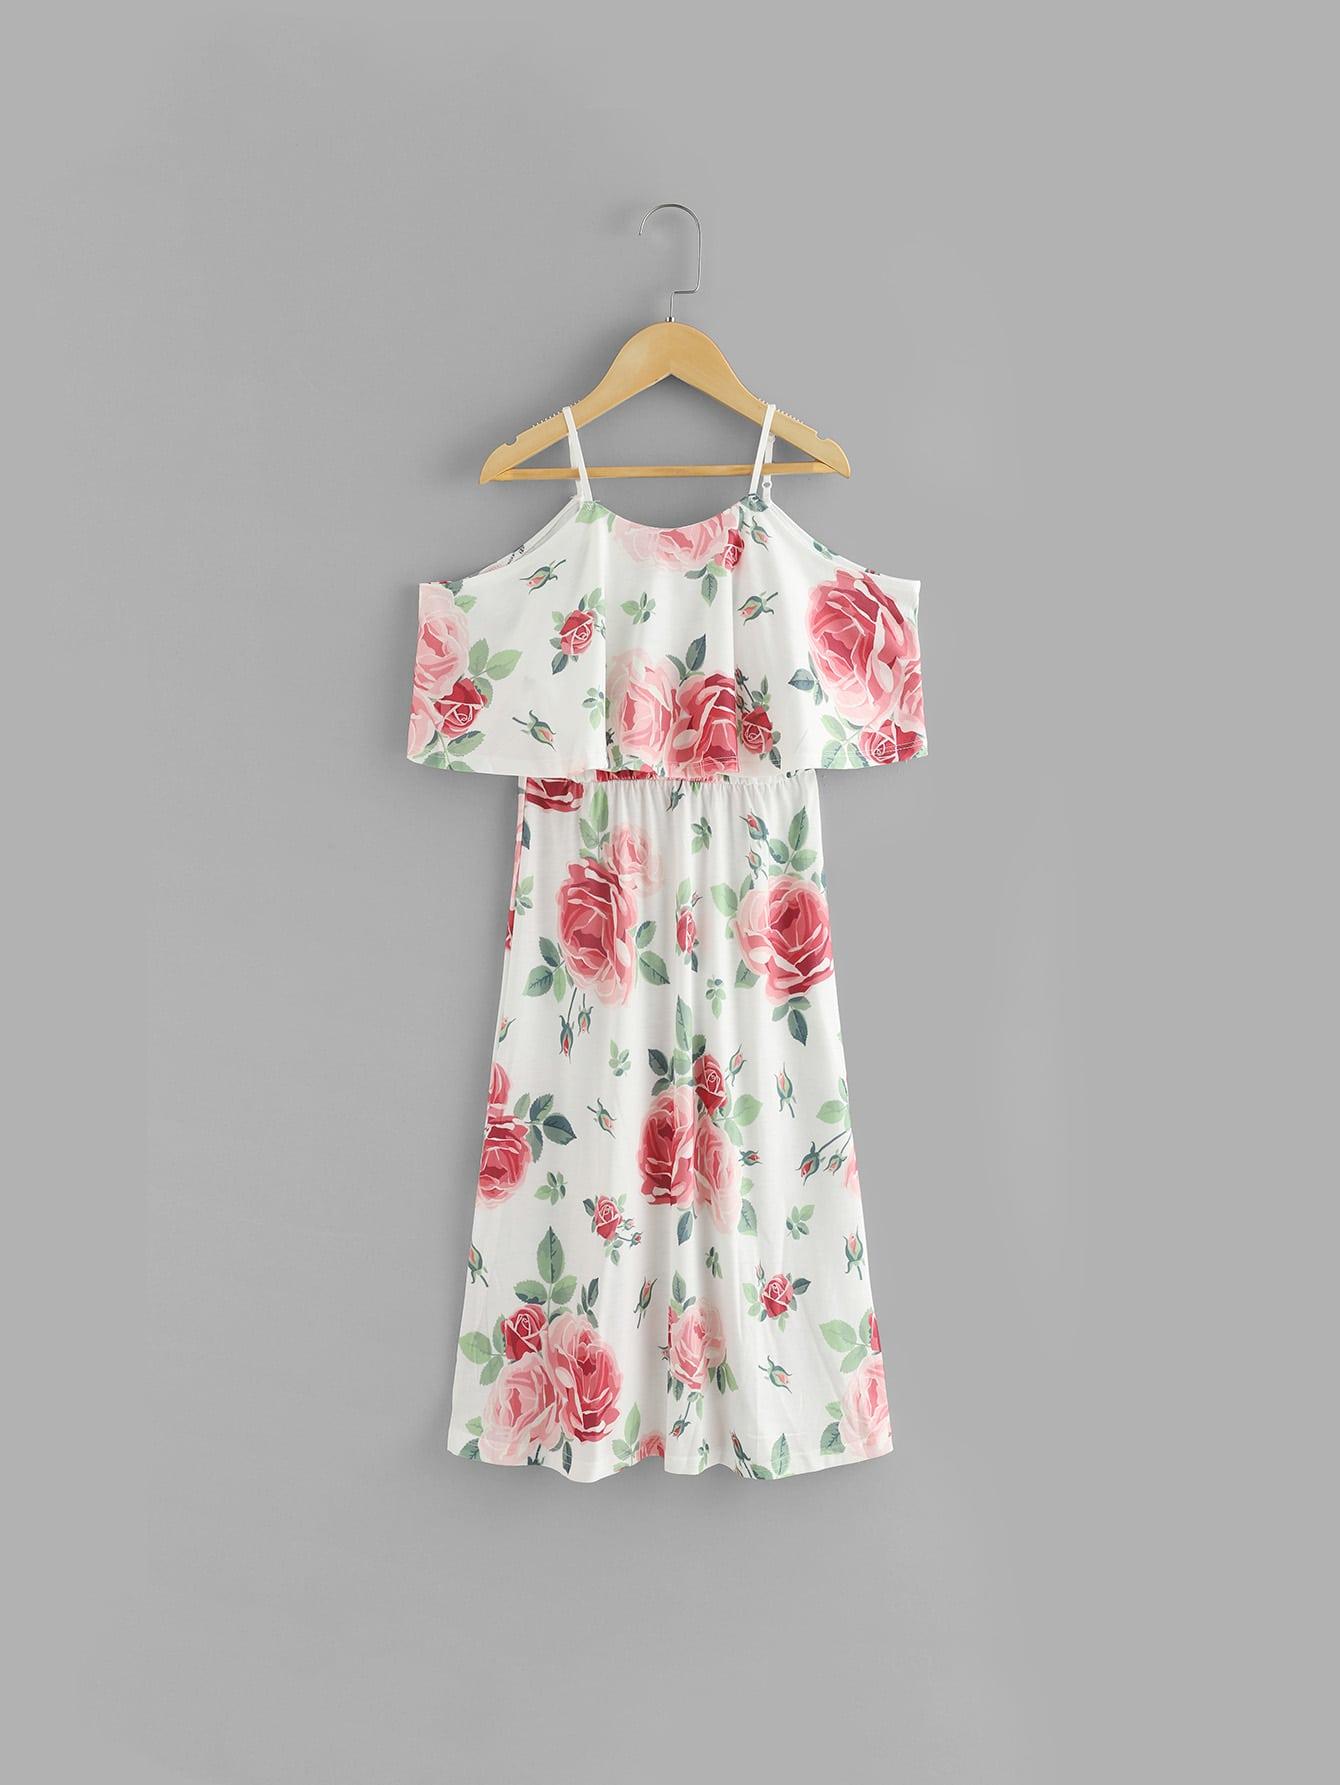 Kids Random Florals Ruffle Layered Dress